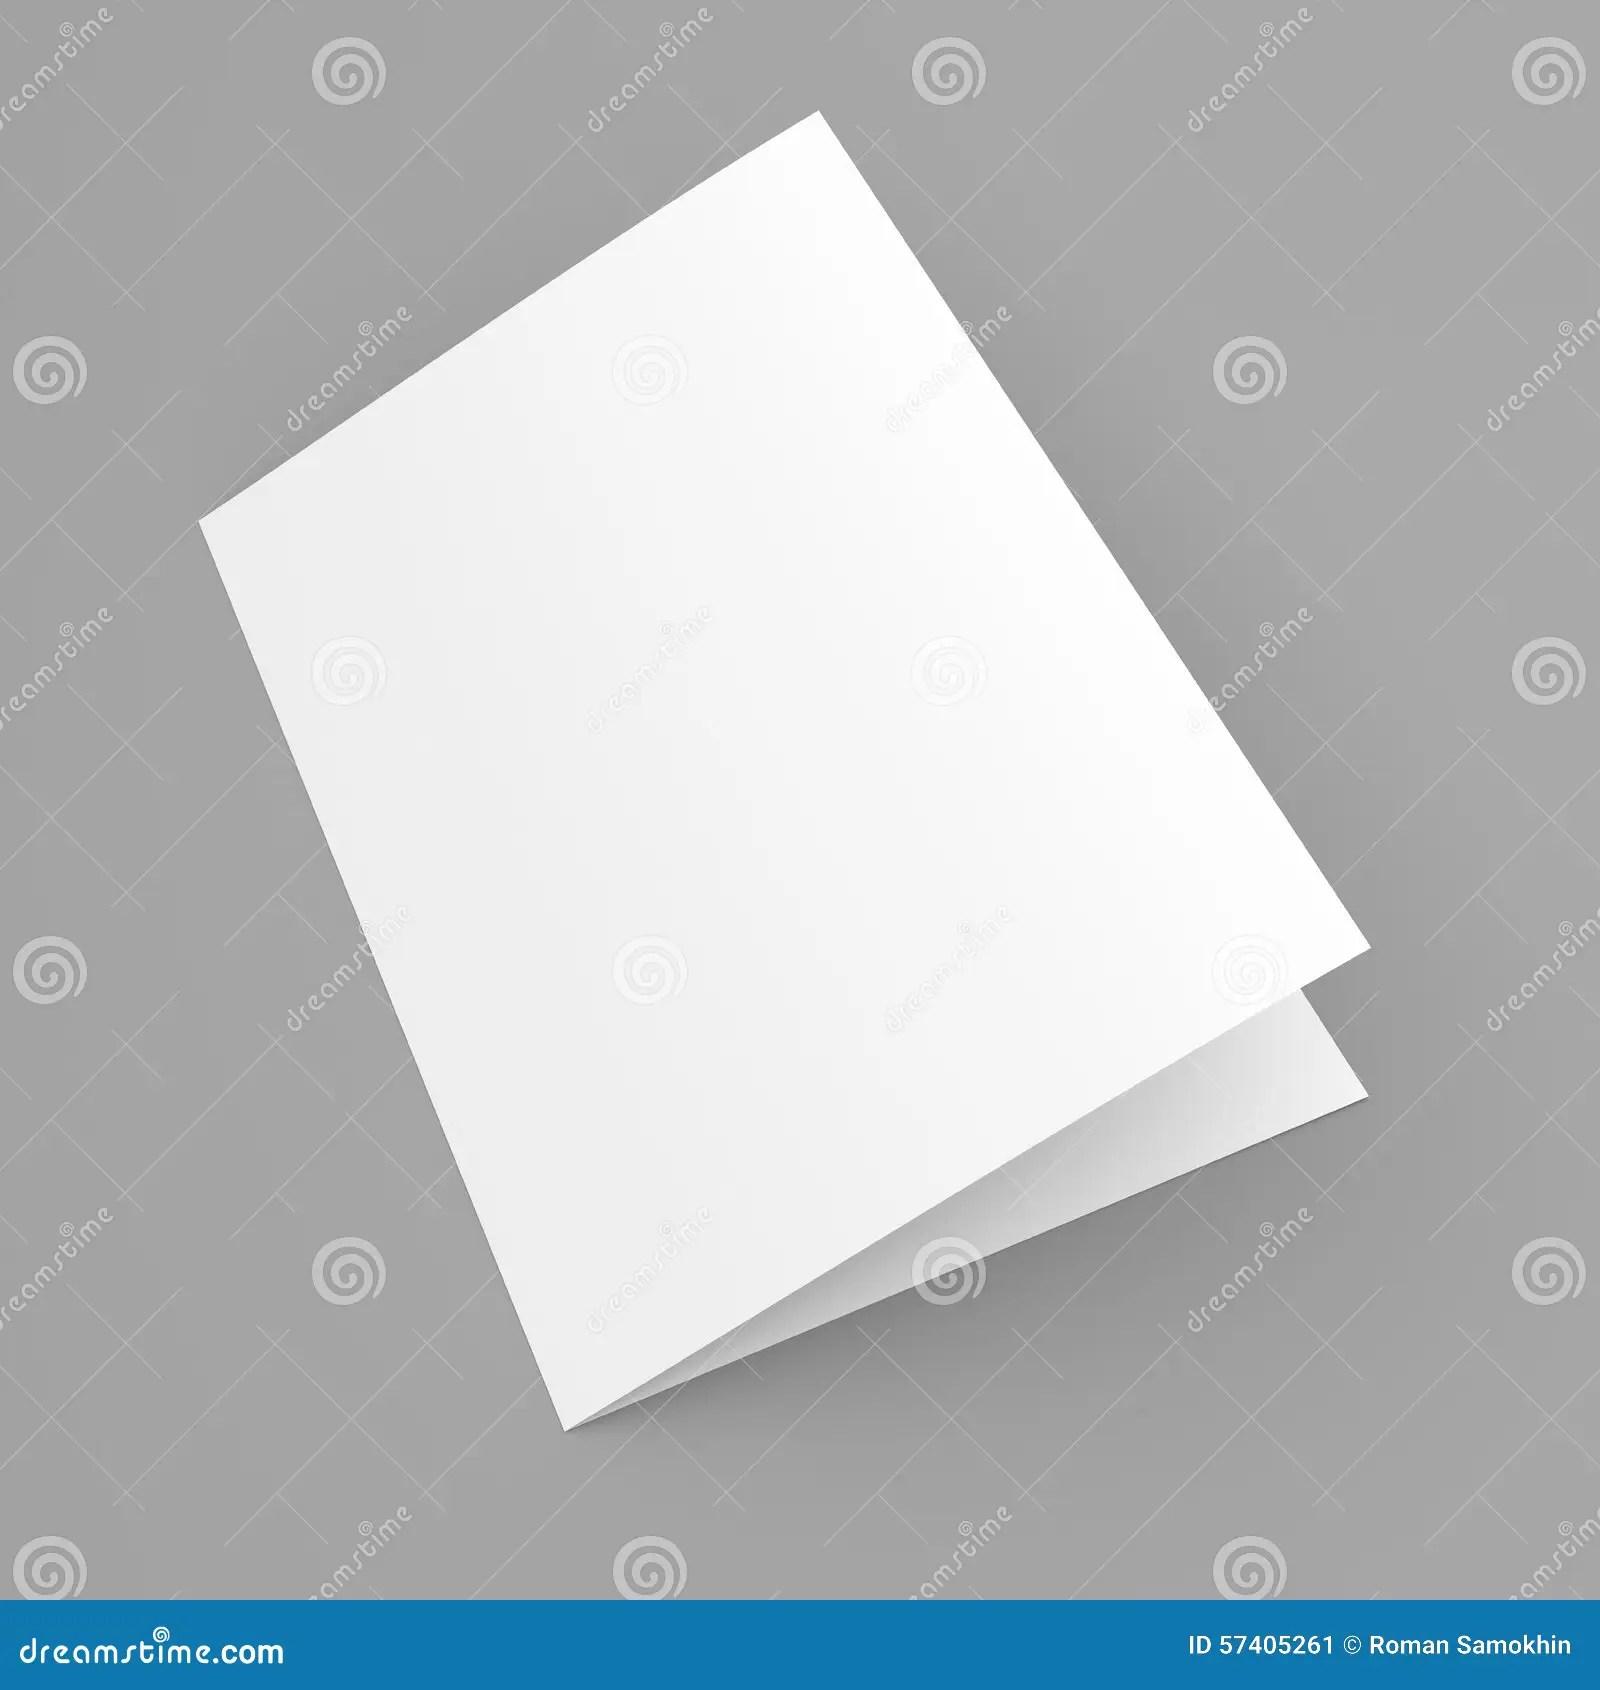 Folding Business Cards Template | Sample CV Resume